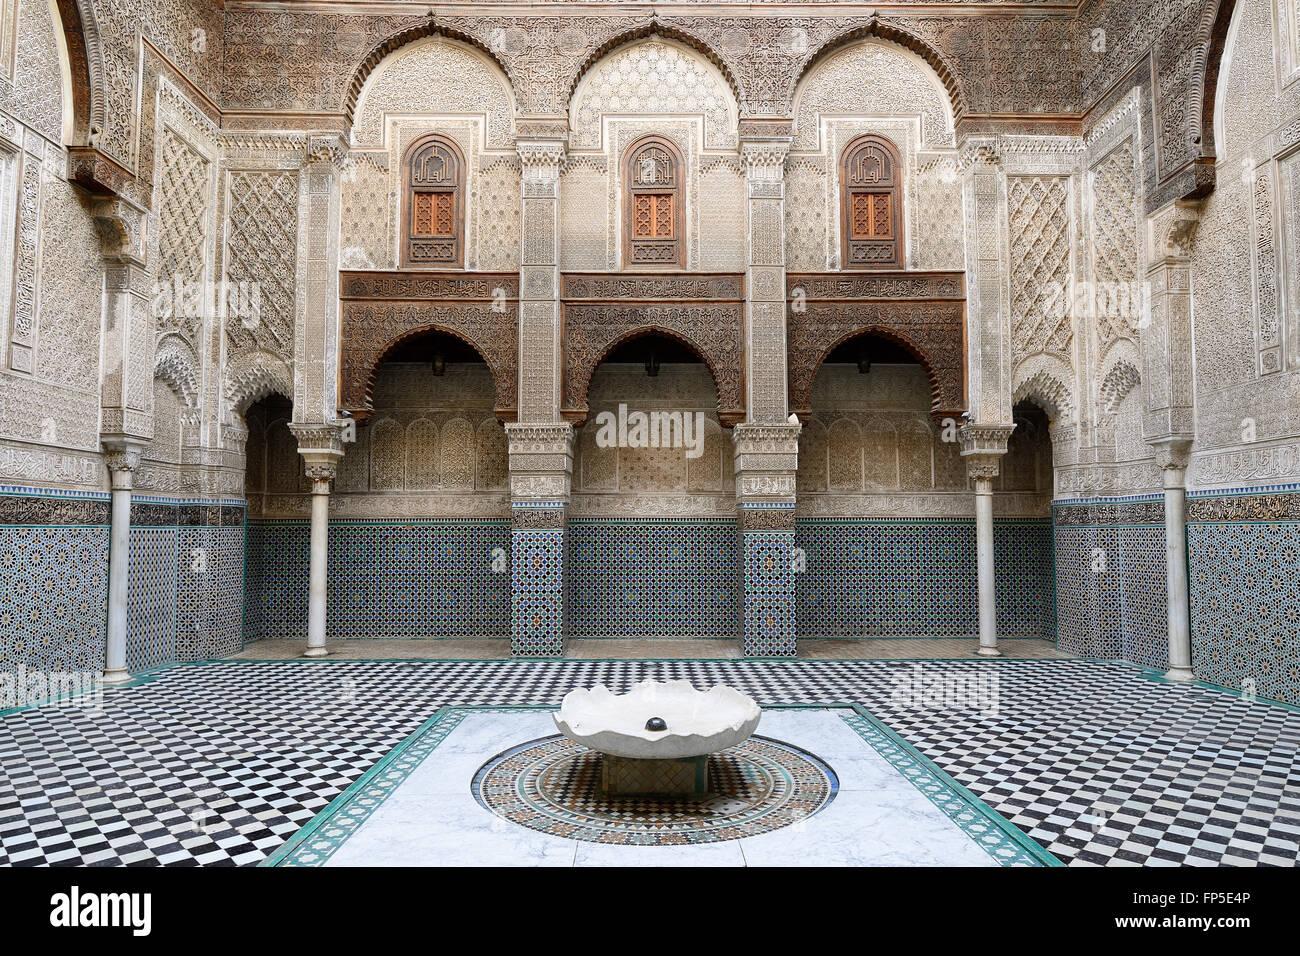 The Interior Of The Al Qarawiyyin Mosque Stock Photo